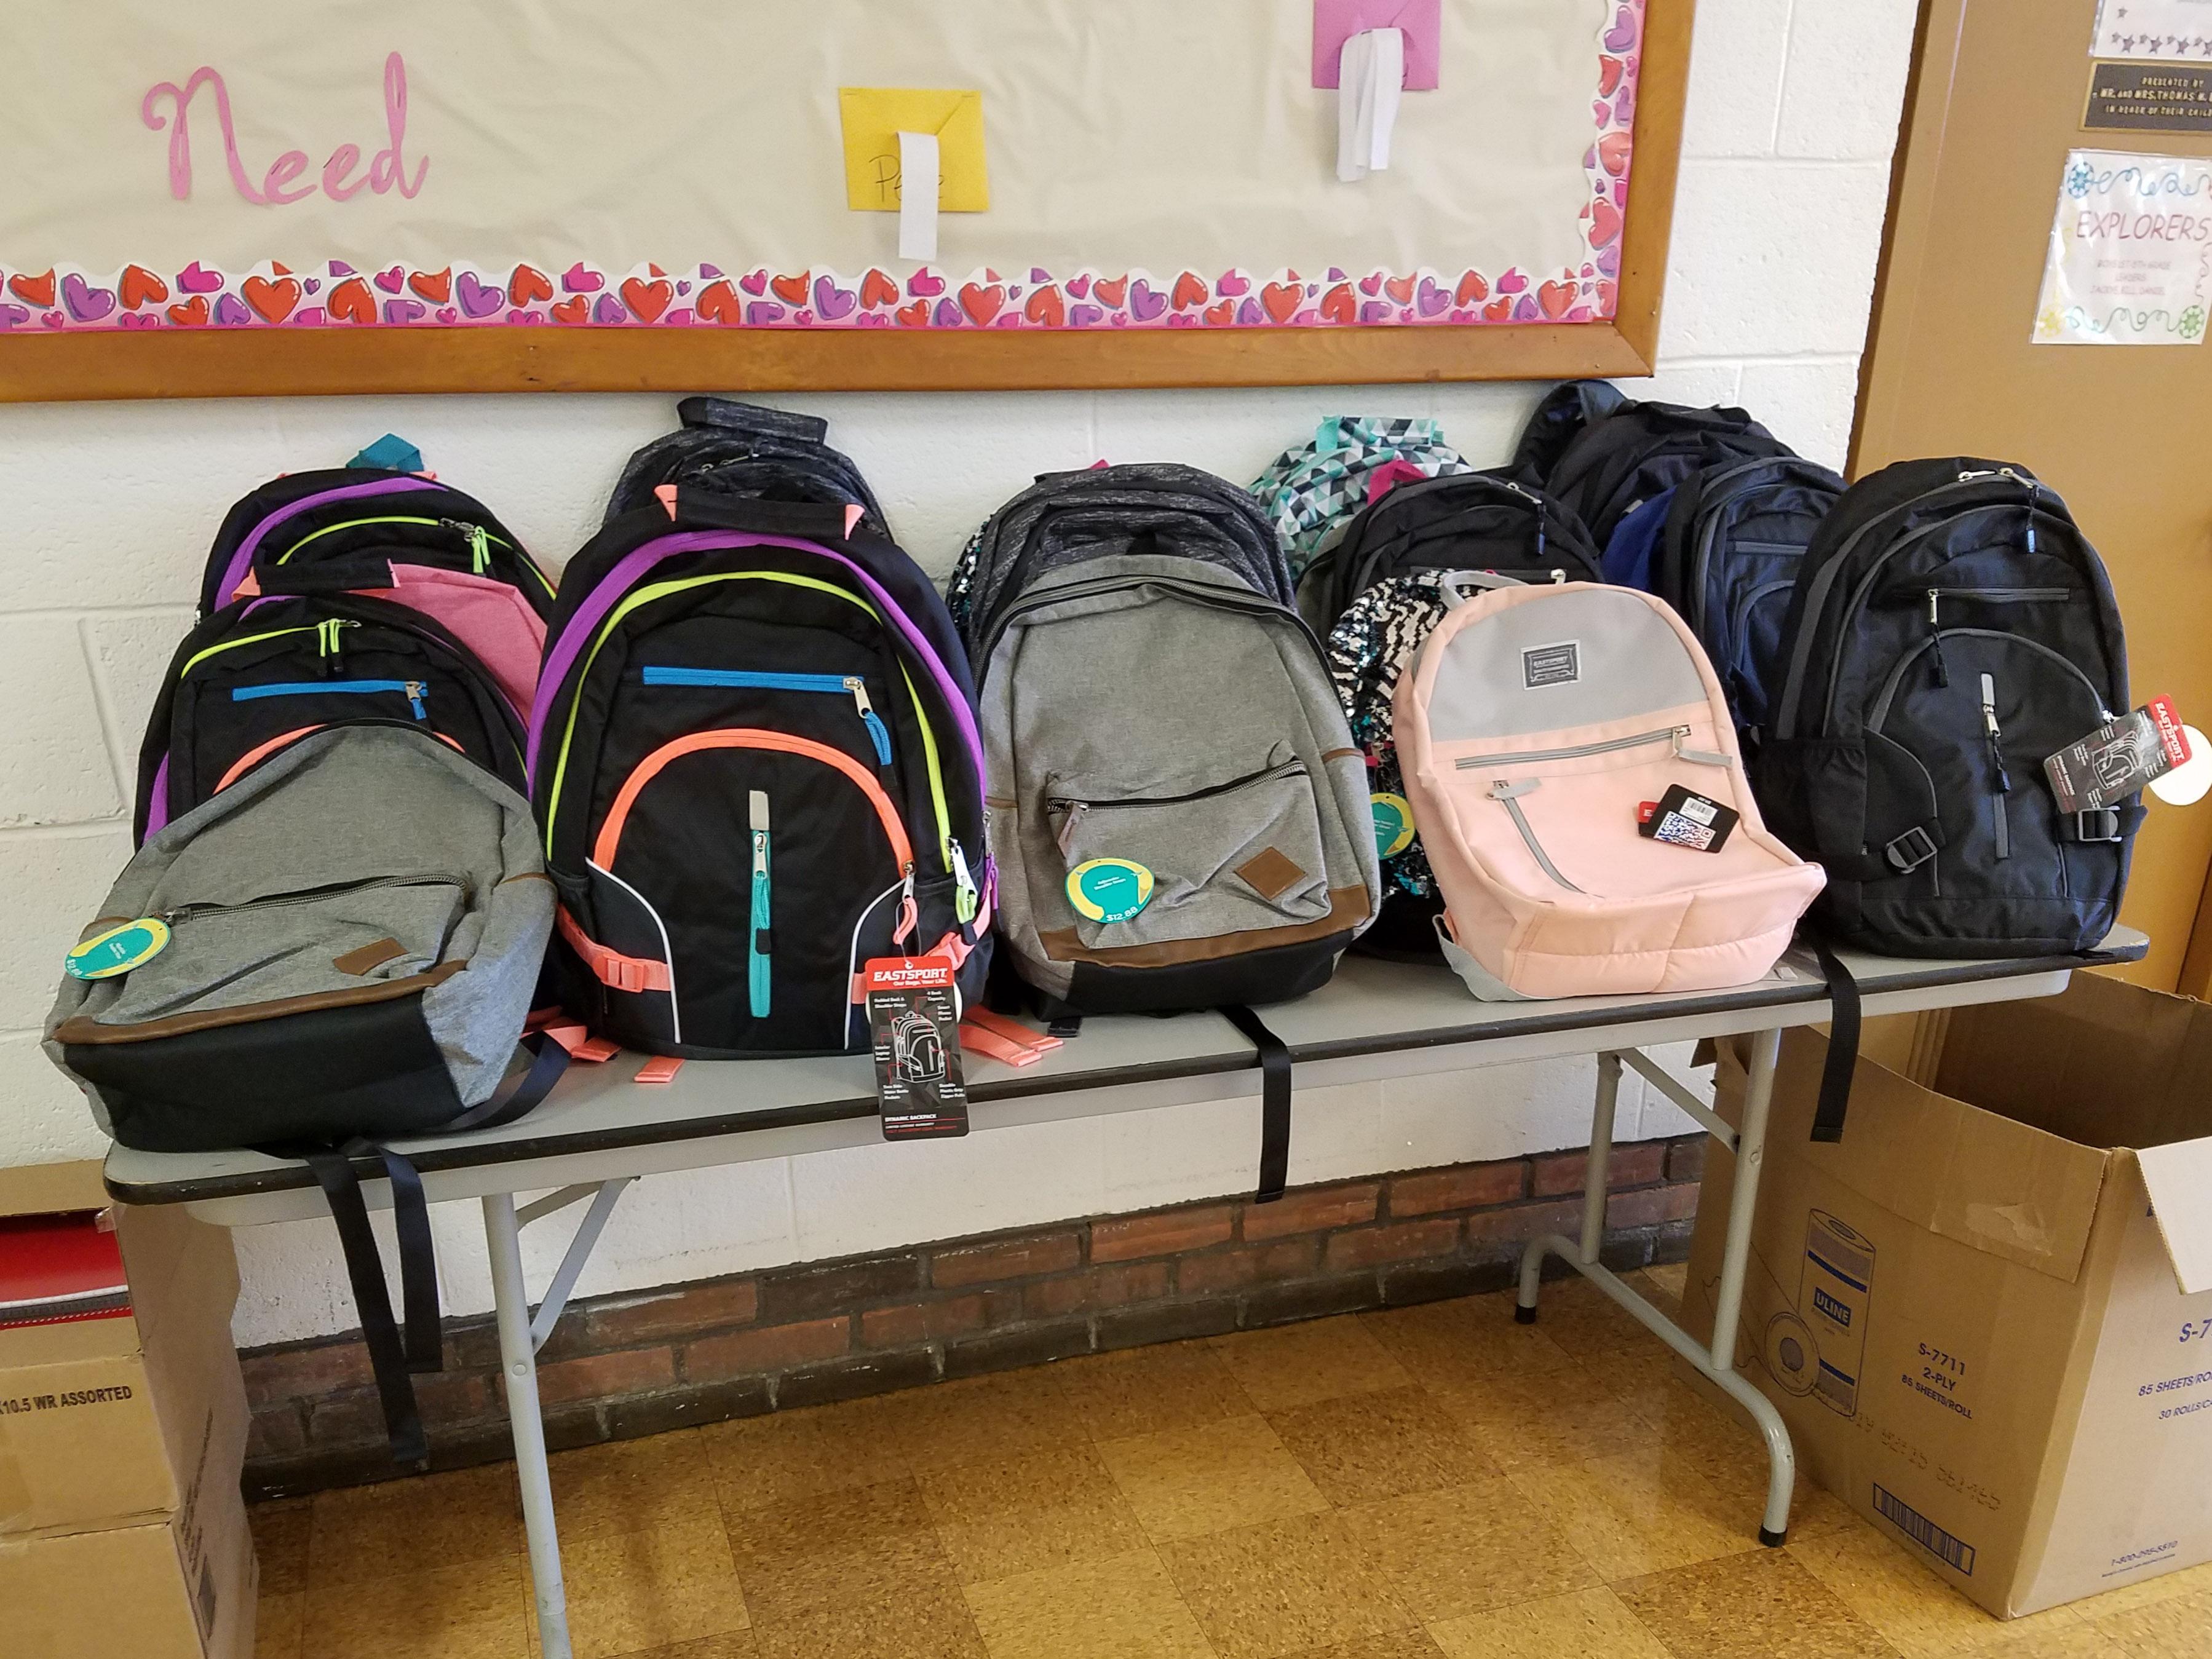 SIMOS Cares helped pack backpacks for school children in West Virginia